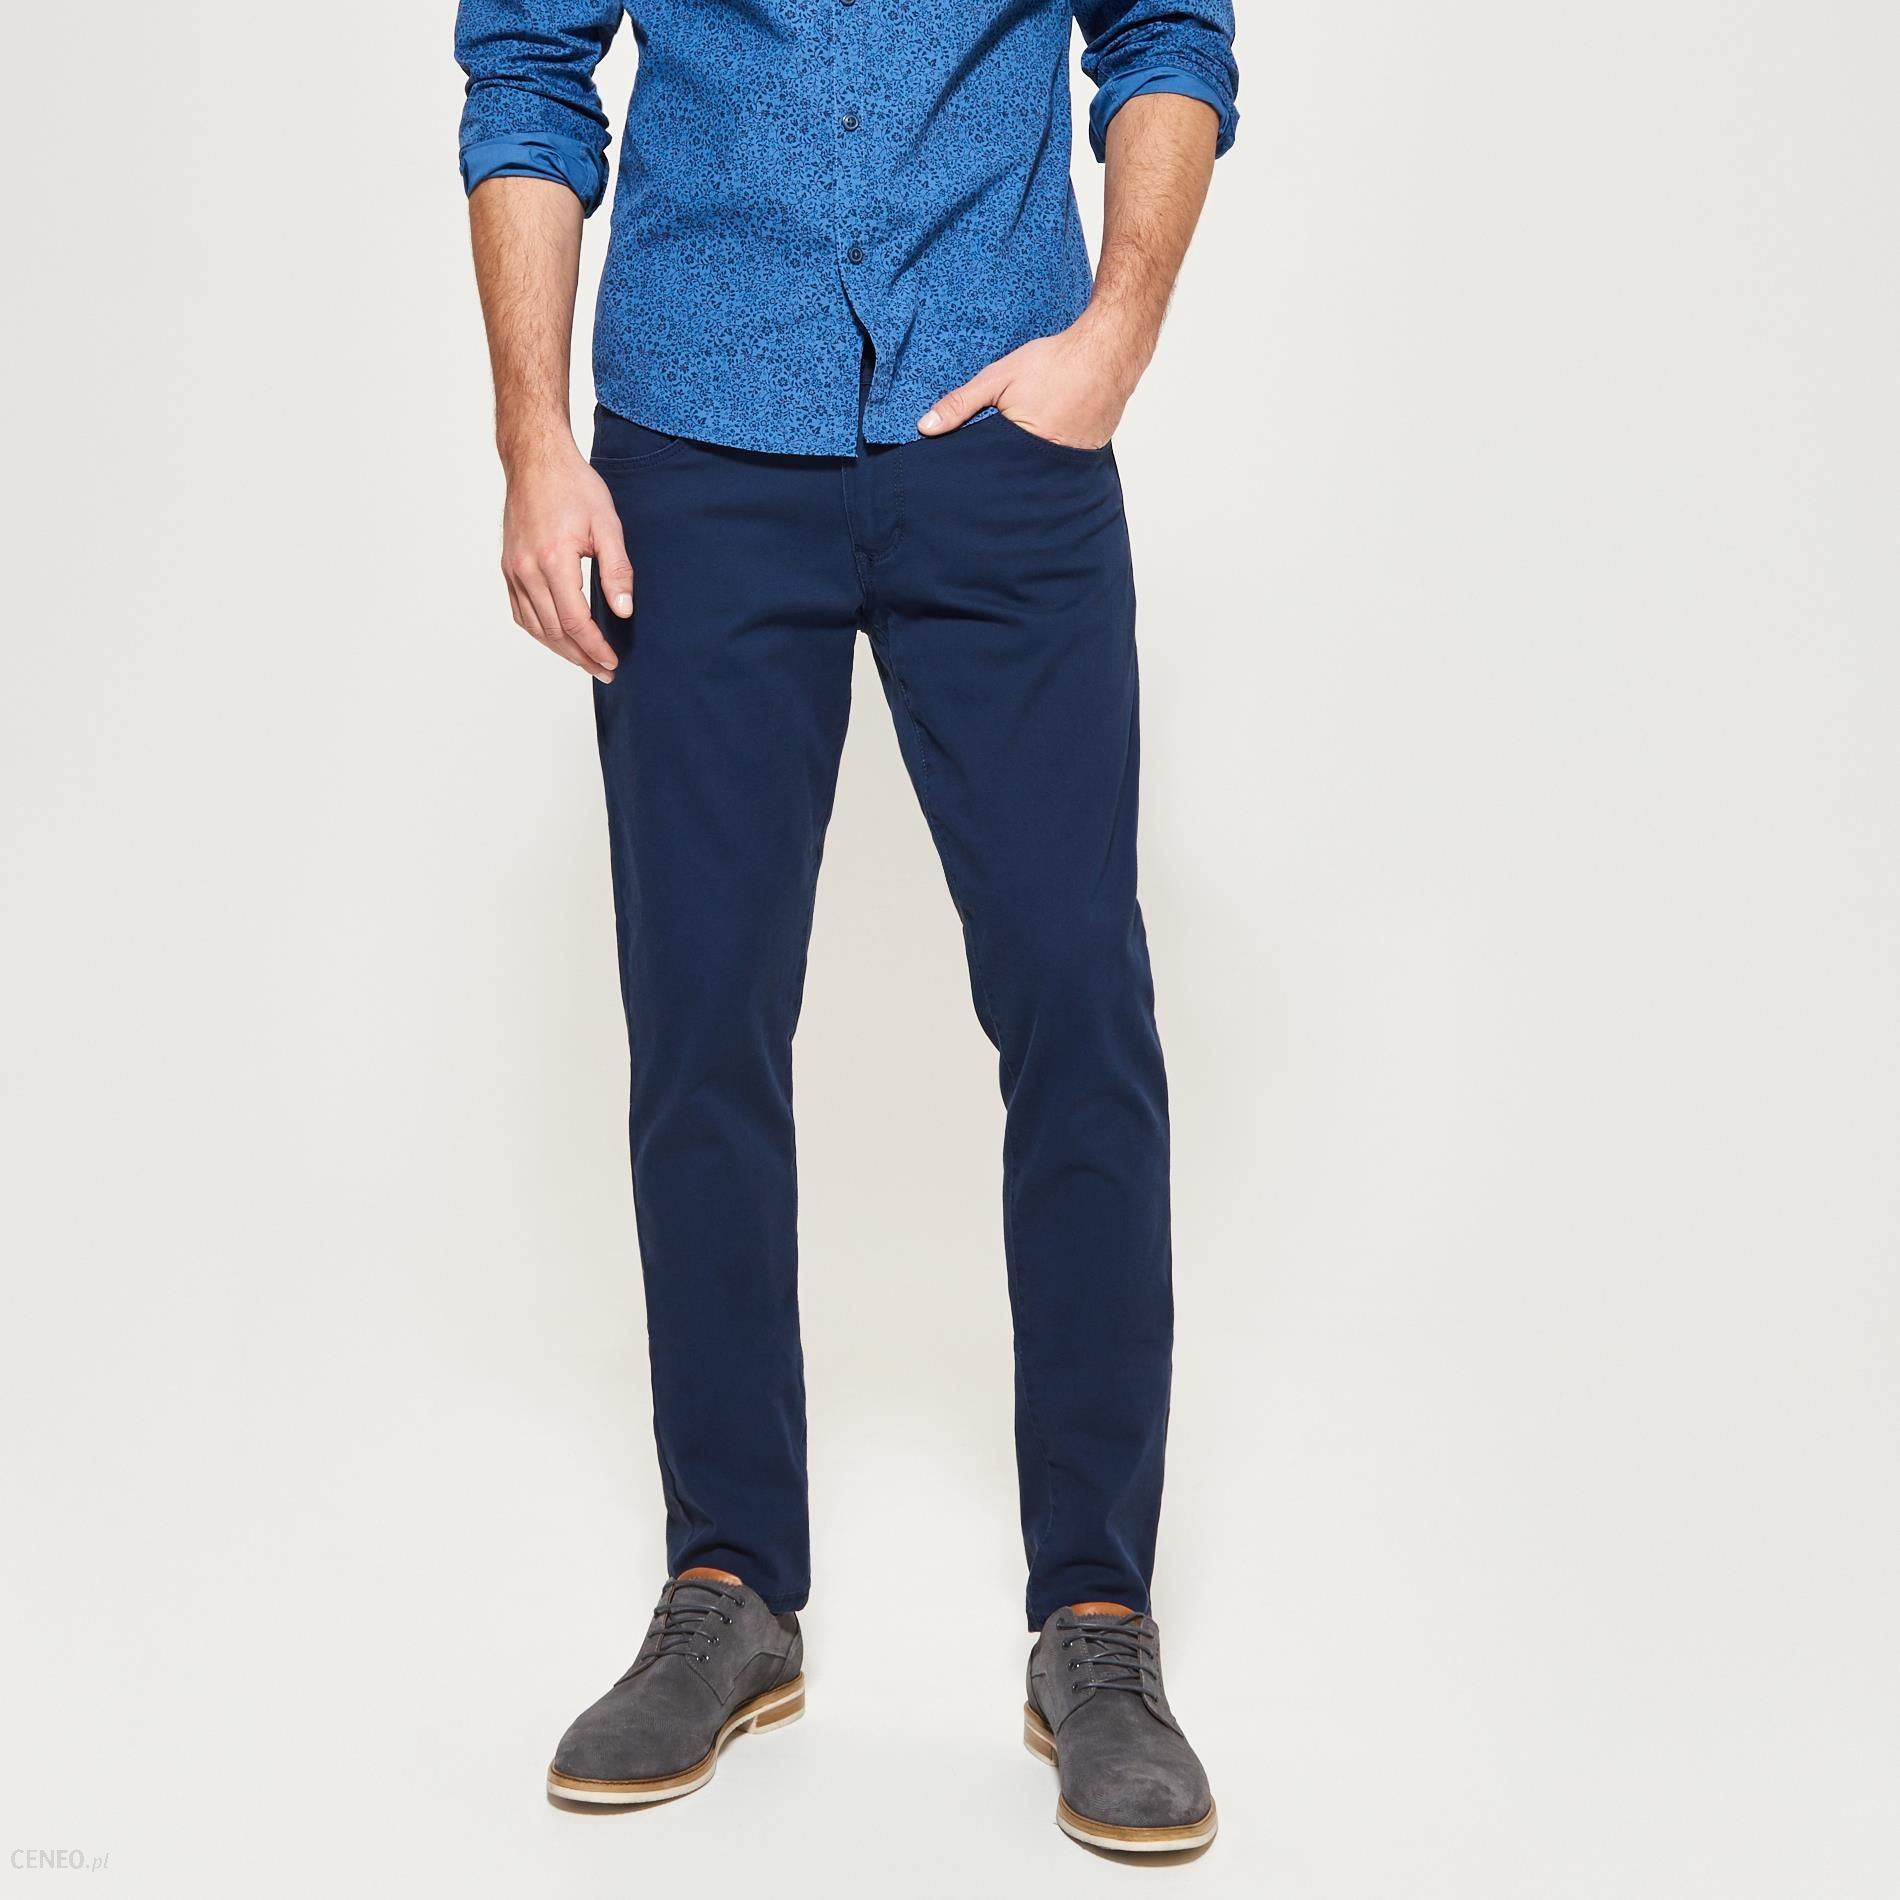 Reserved Spodnie super slim fit Granatowy męska